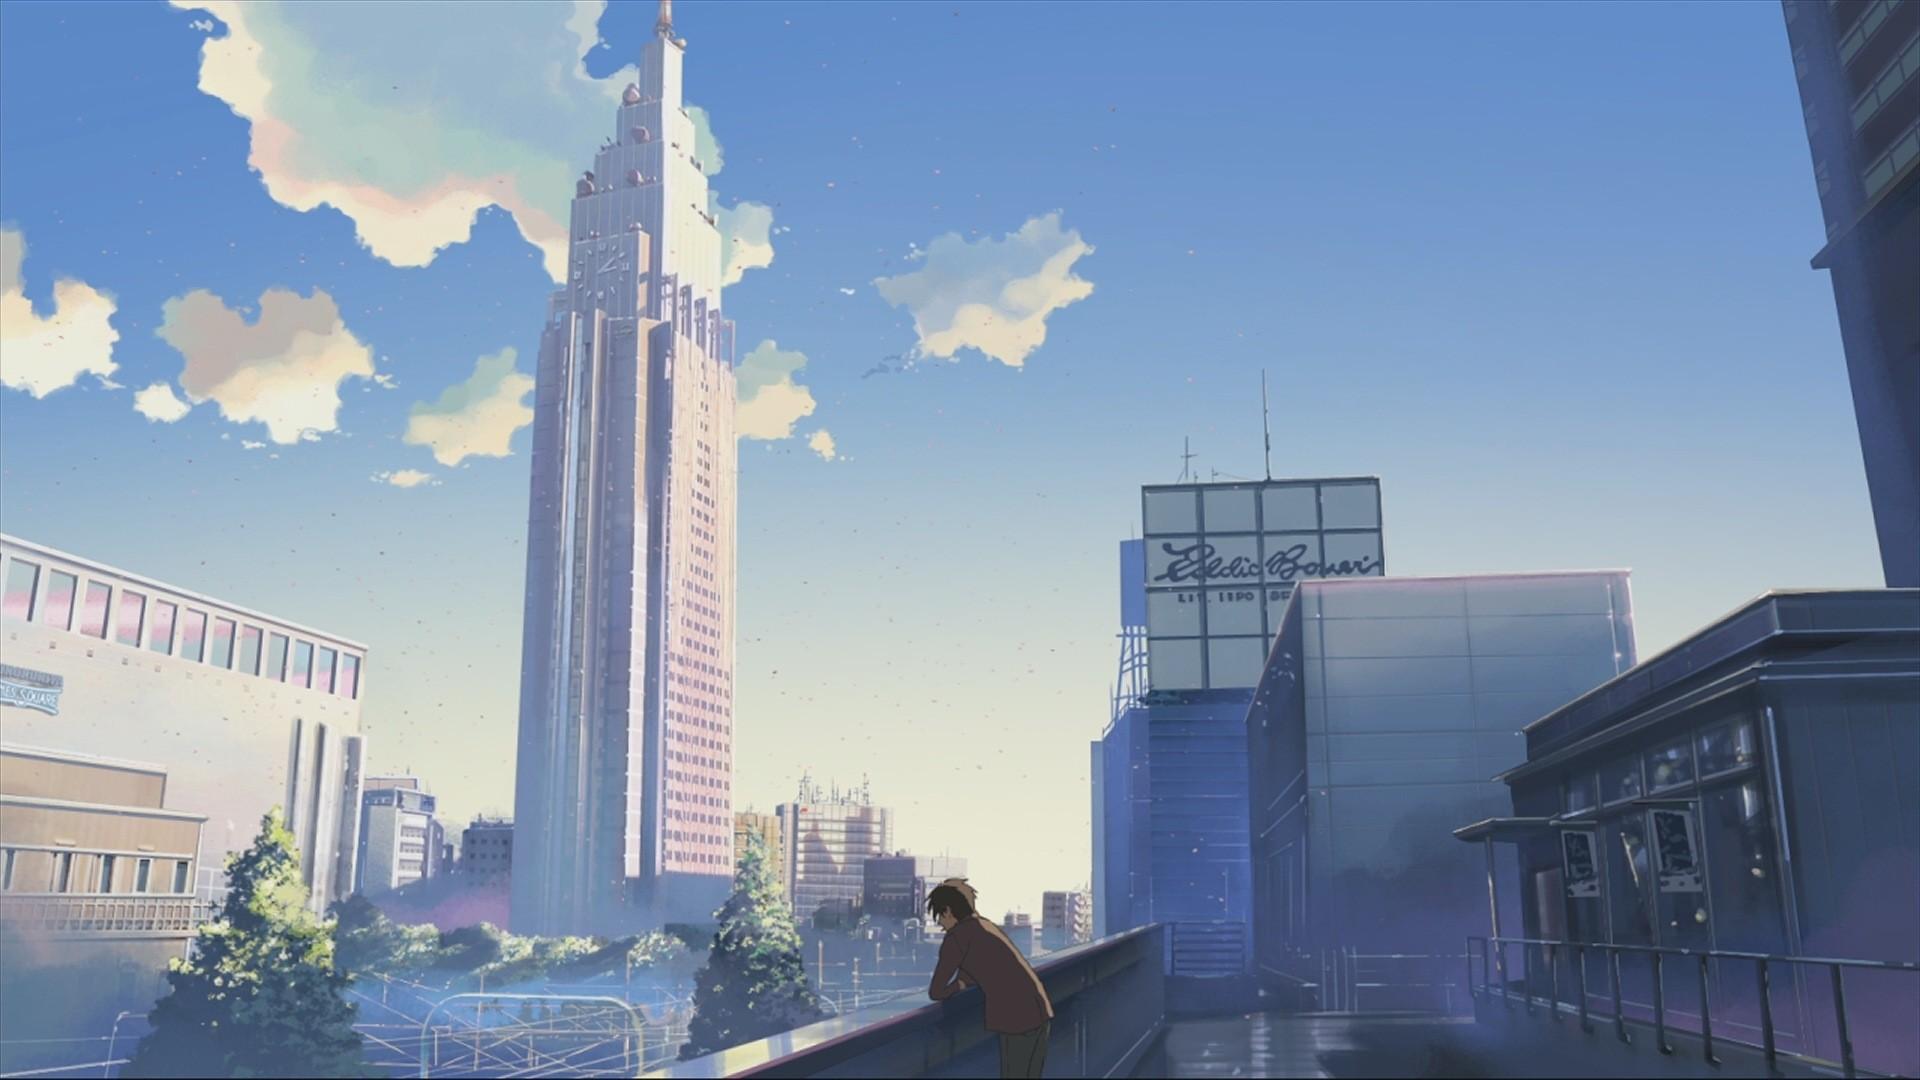 Wallpaper City Cityscape Architecture Anime Skyline